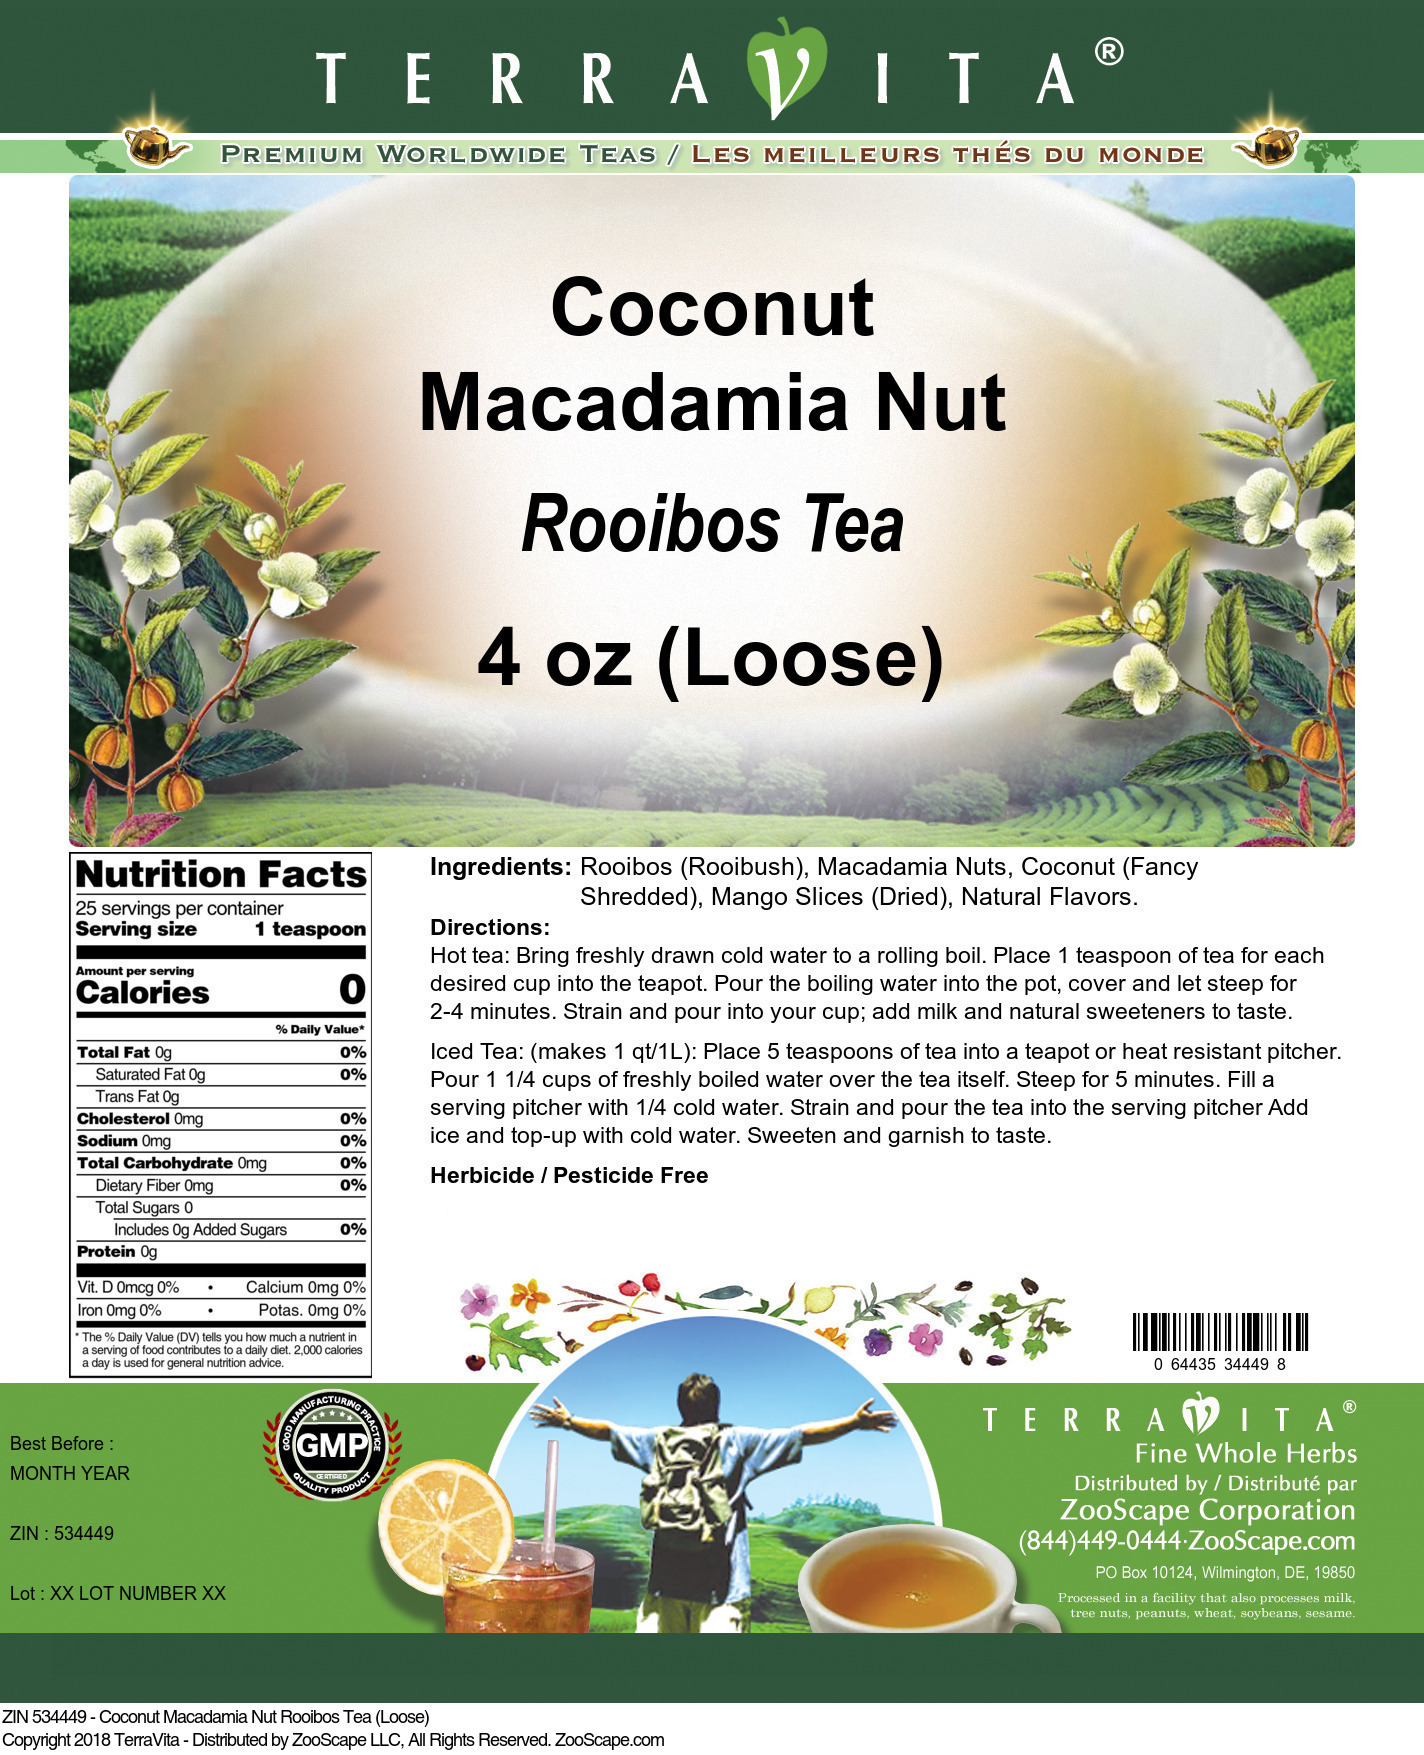 Coconut Macadamia Nut Rooibos Tea (Loose)